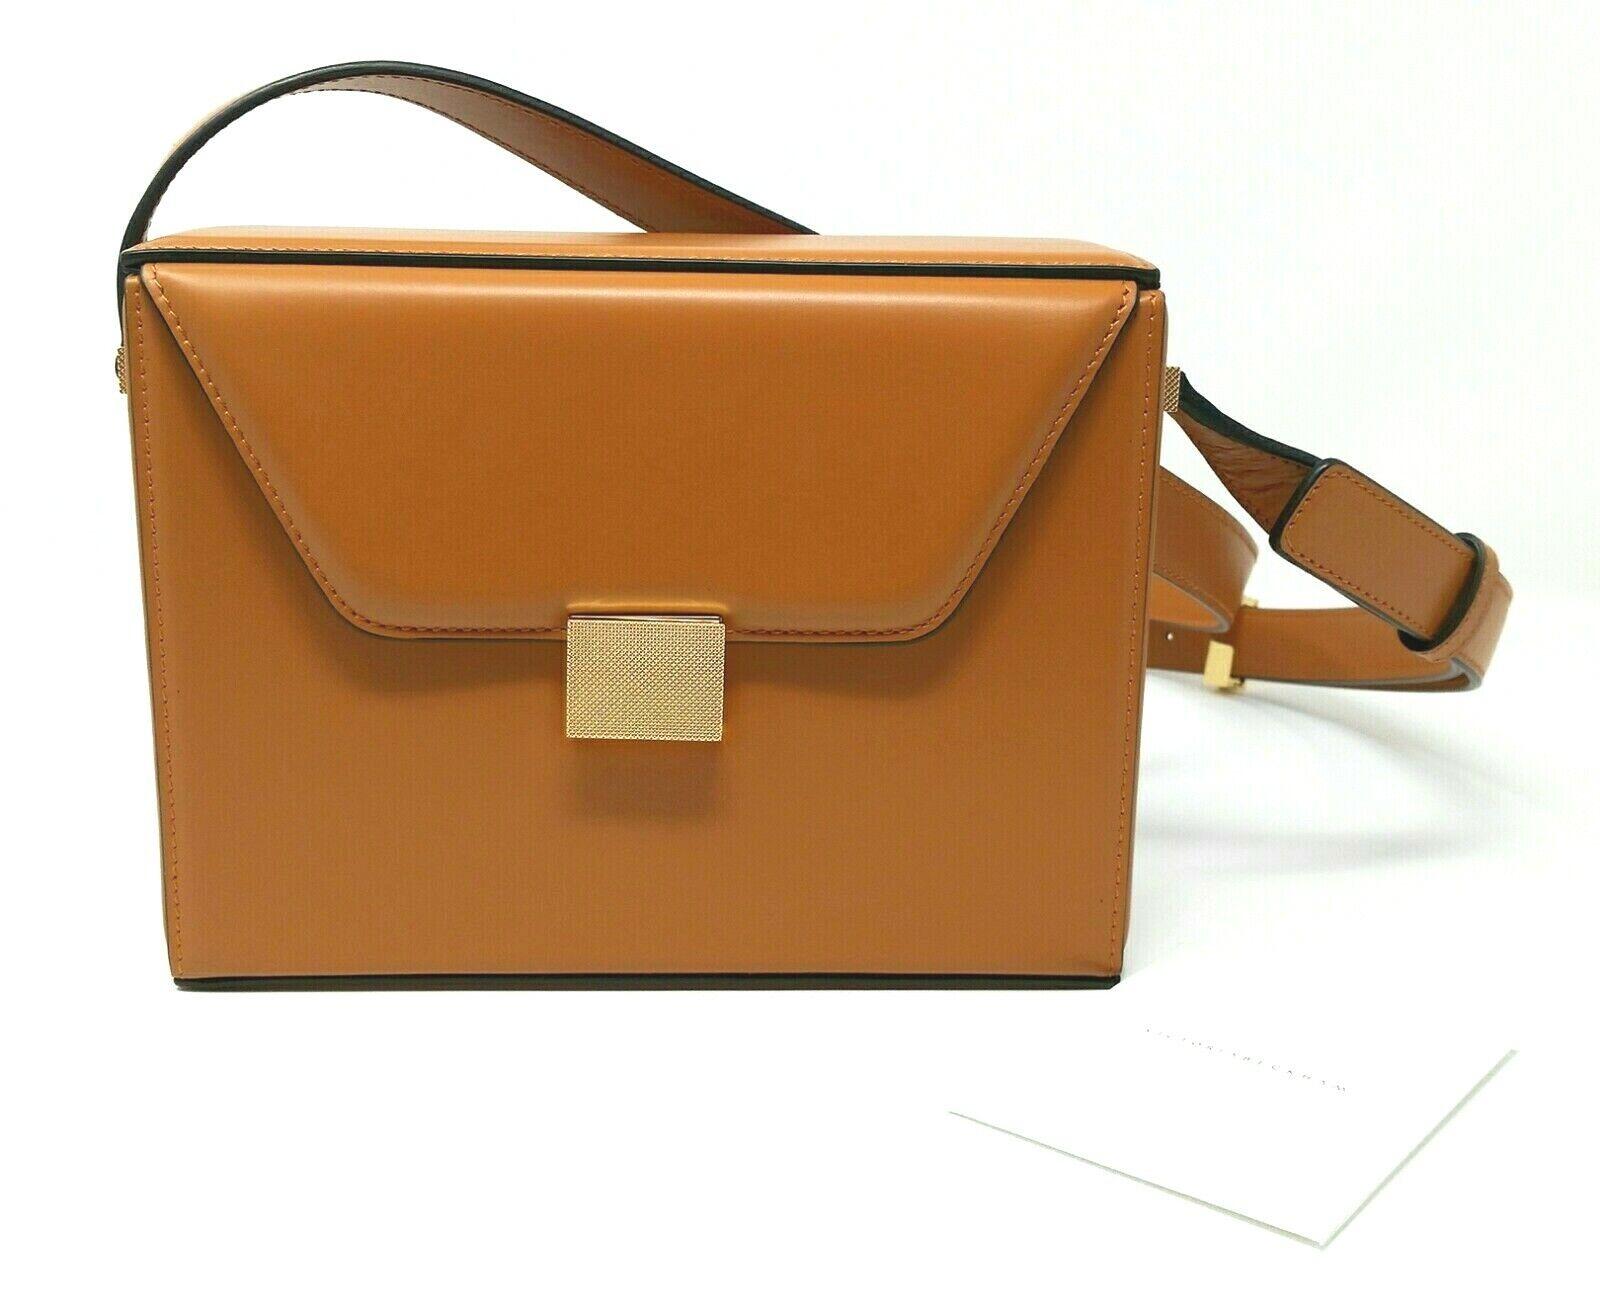 NWT Victoria Beckham Runway Vanity Box Camel Calf Leather Crossbody Bag